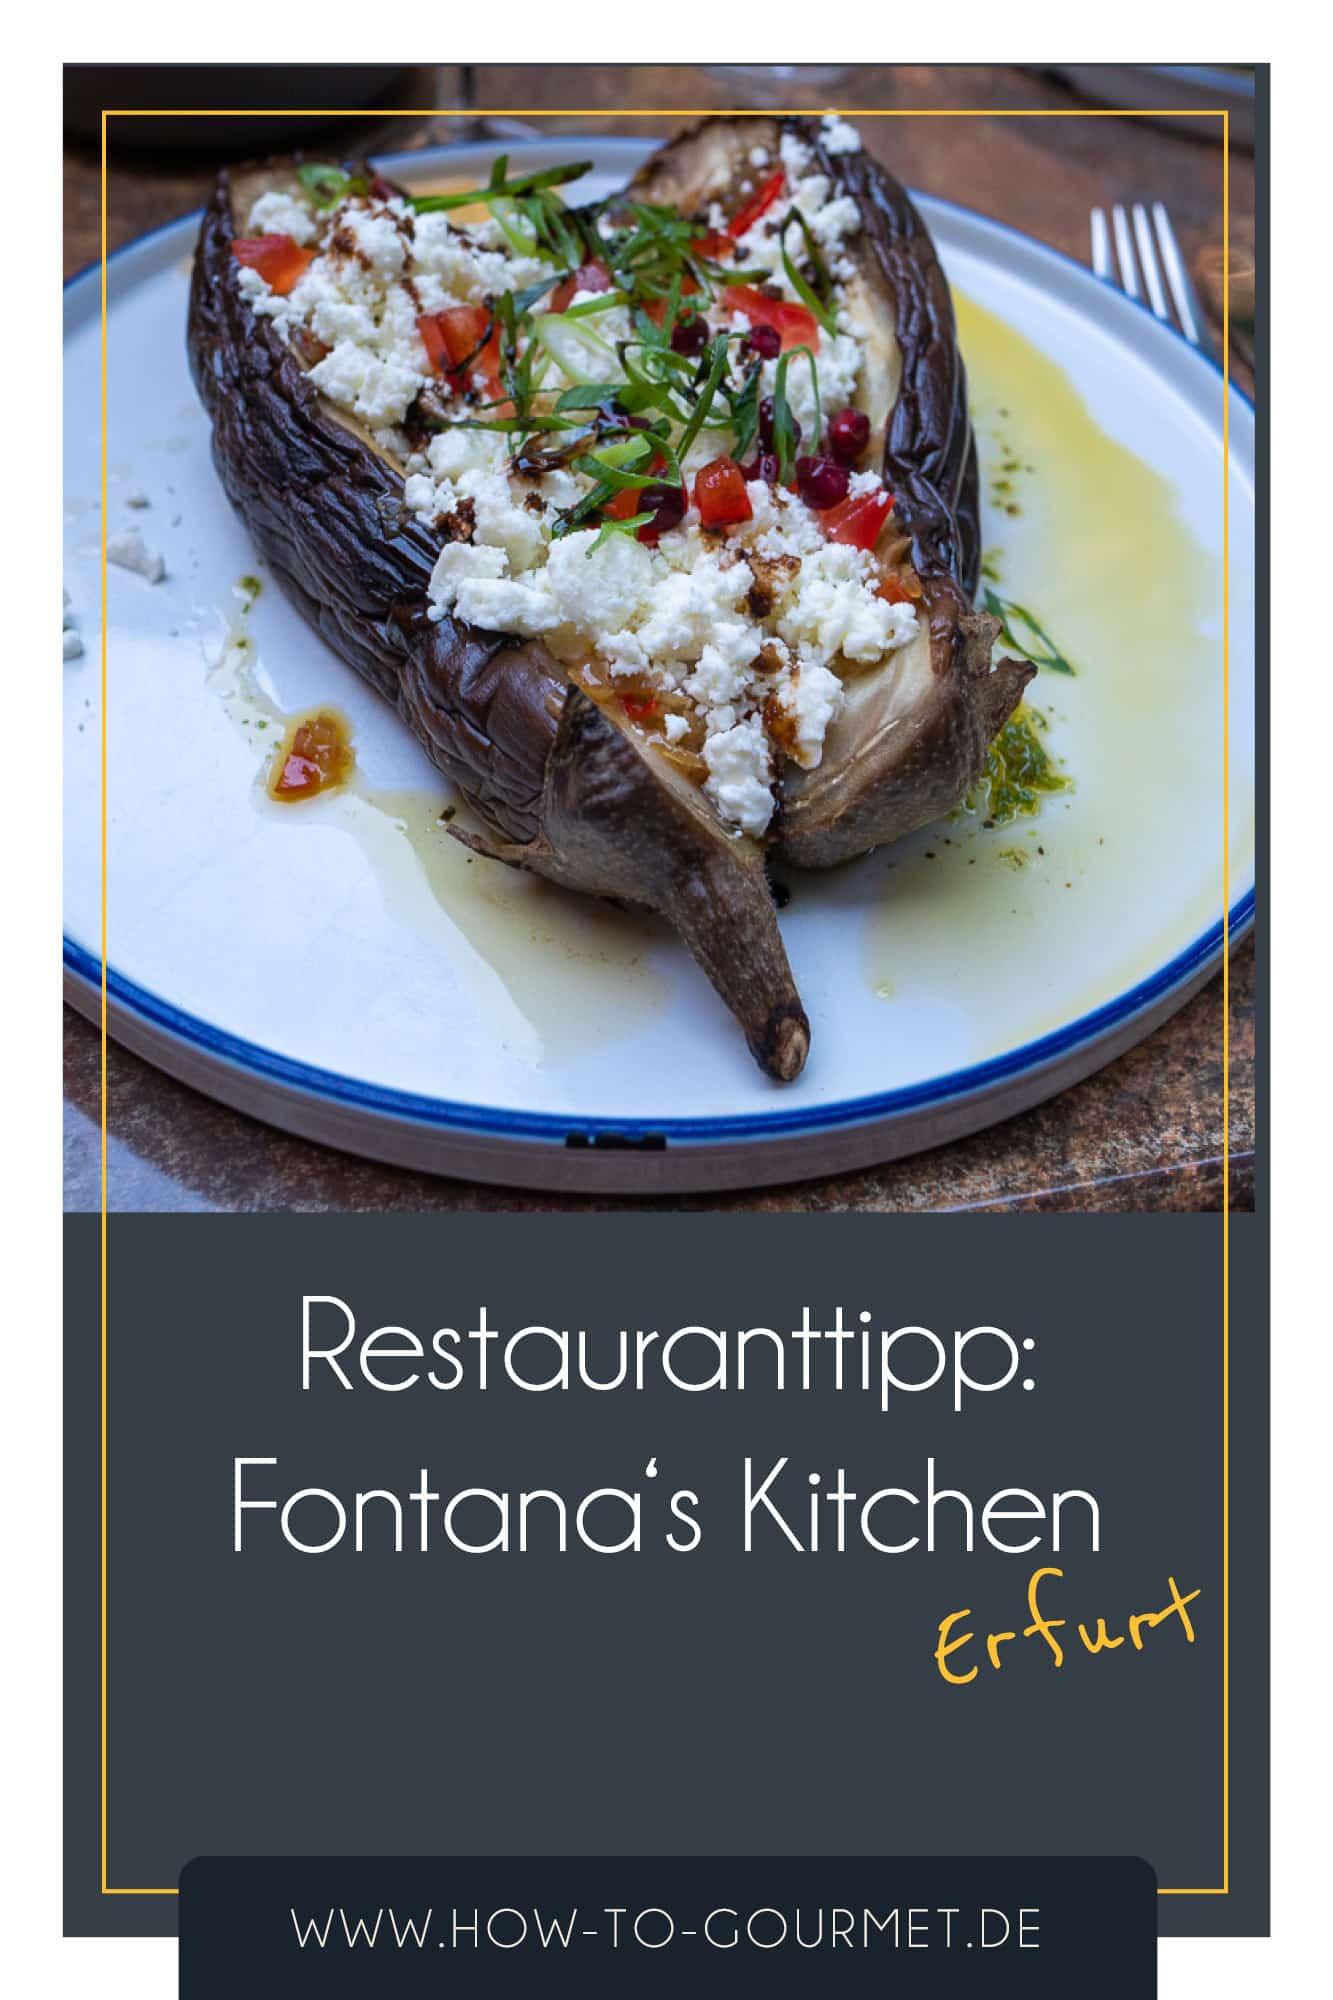 Fontanas kitchen erfurt